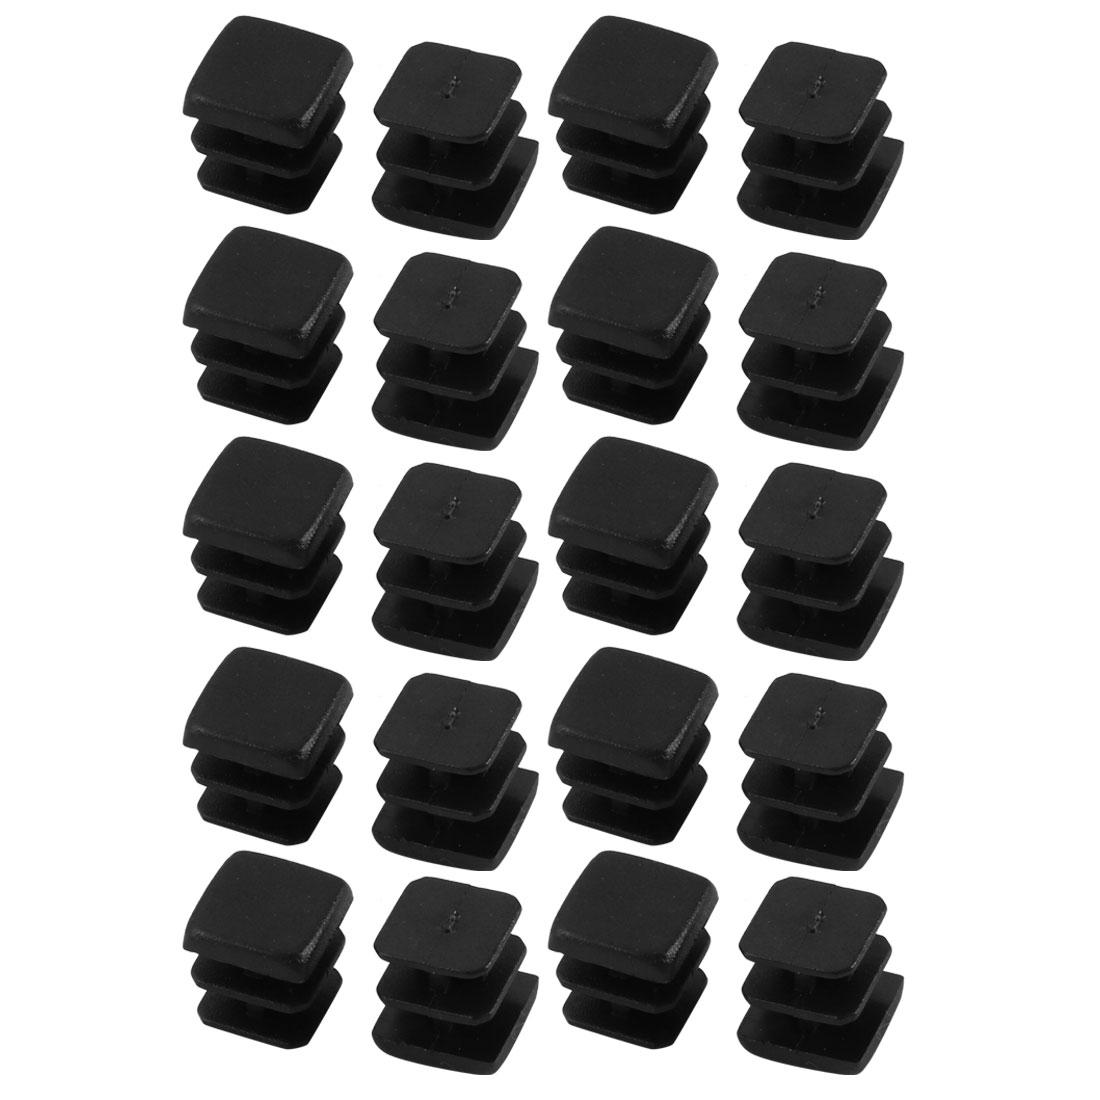 20pcs Furniture Legs Protector Plastic Square Tube Inserts Cap Black 10mm x 10mm